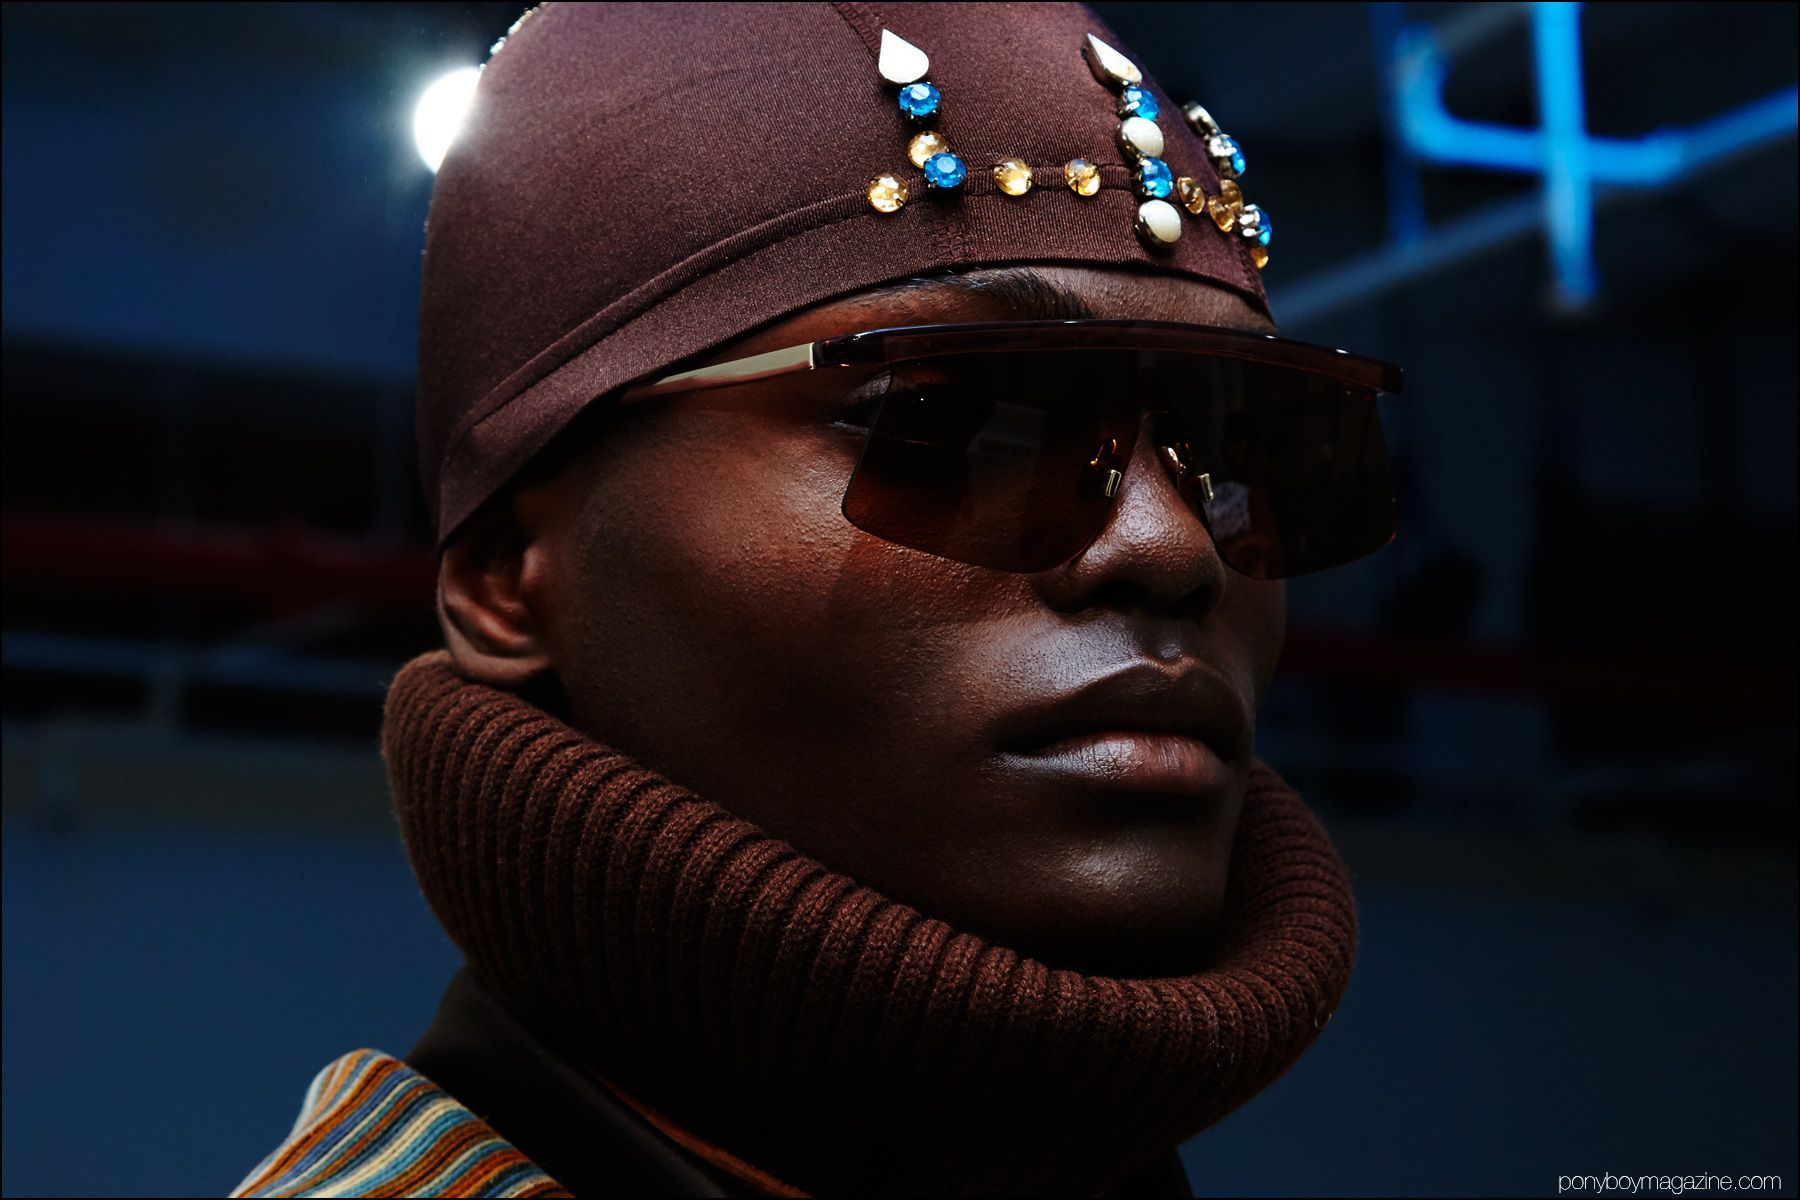 Embellished headwear photographed at Gypsy Sport F/W16 menswear presentation by Alexander Thompson for Ponyboy magazine NY.